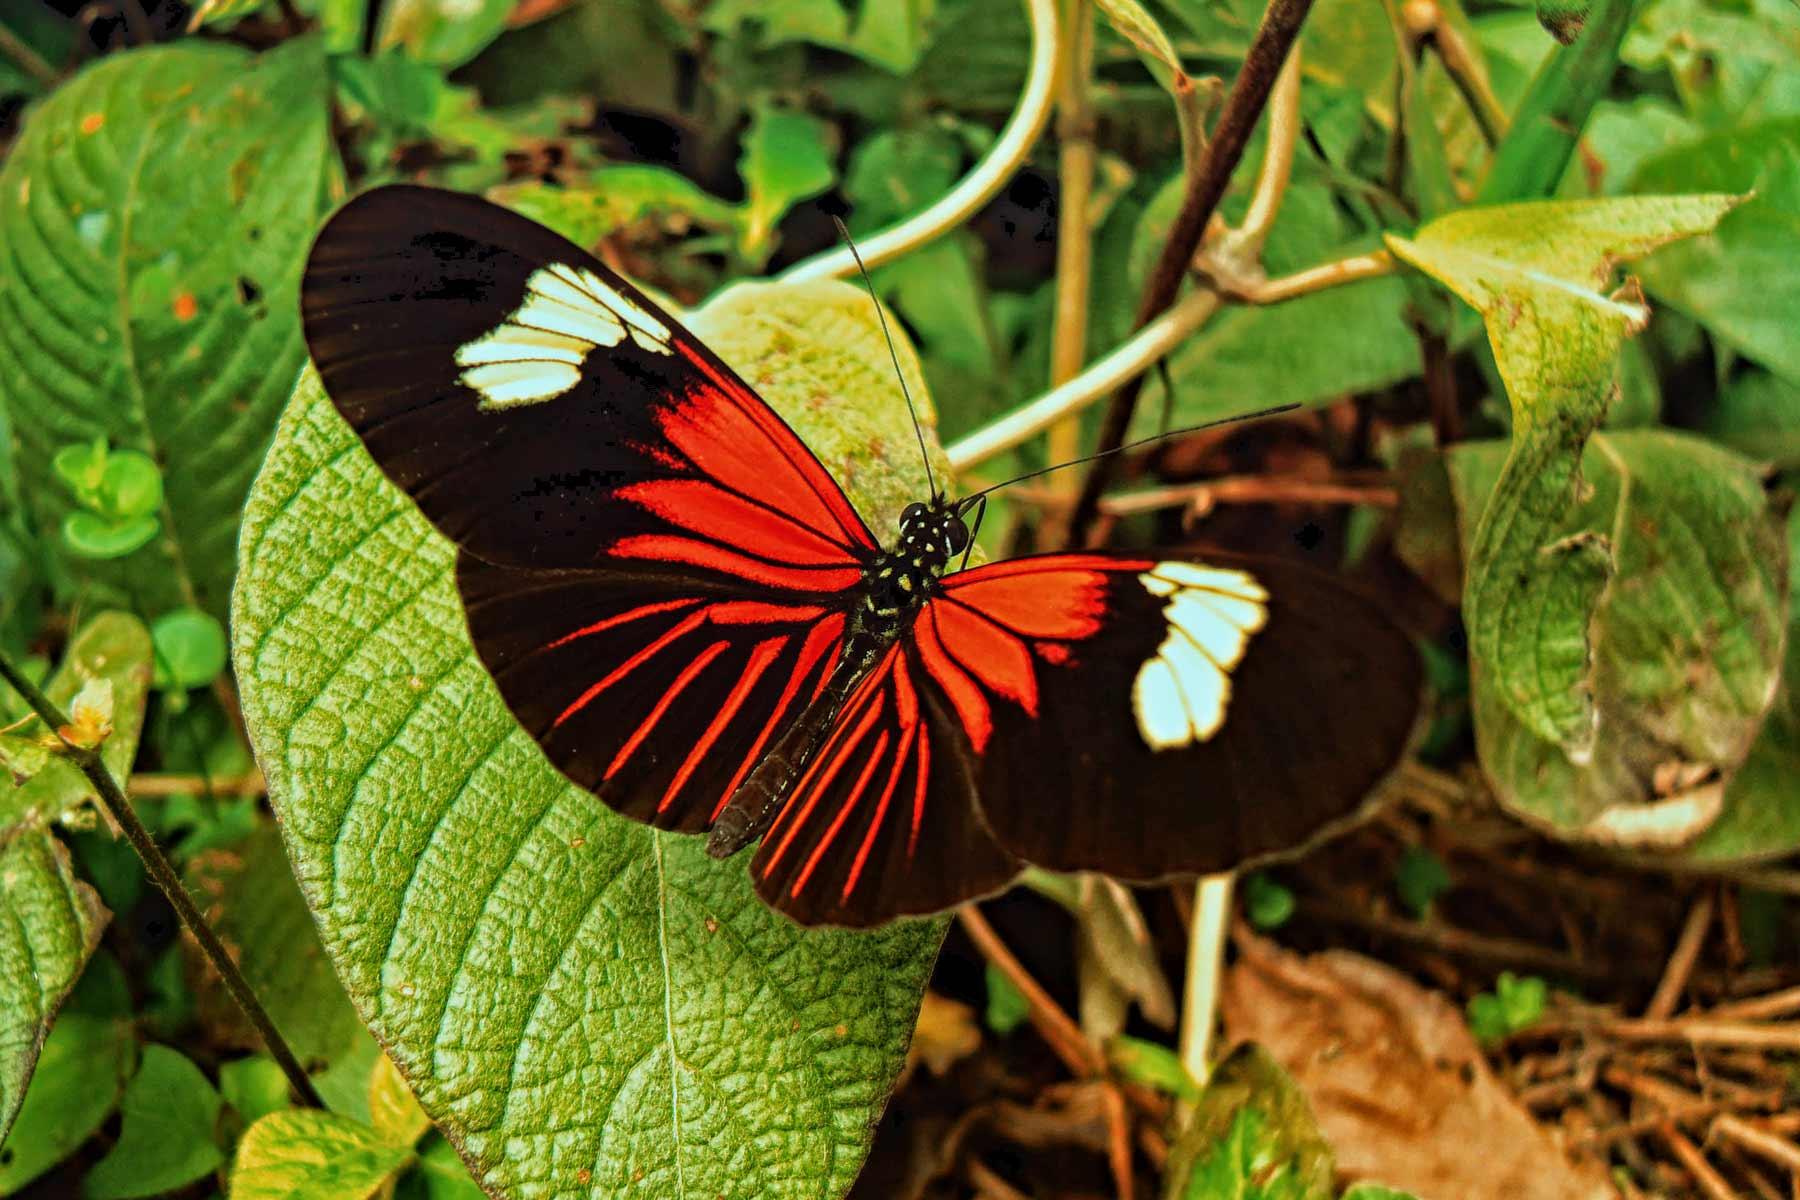 Mariposa fauna peruana